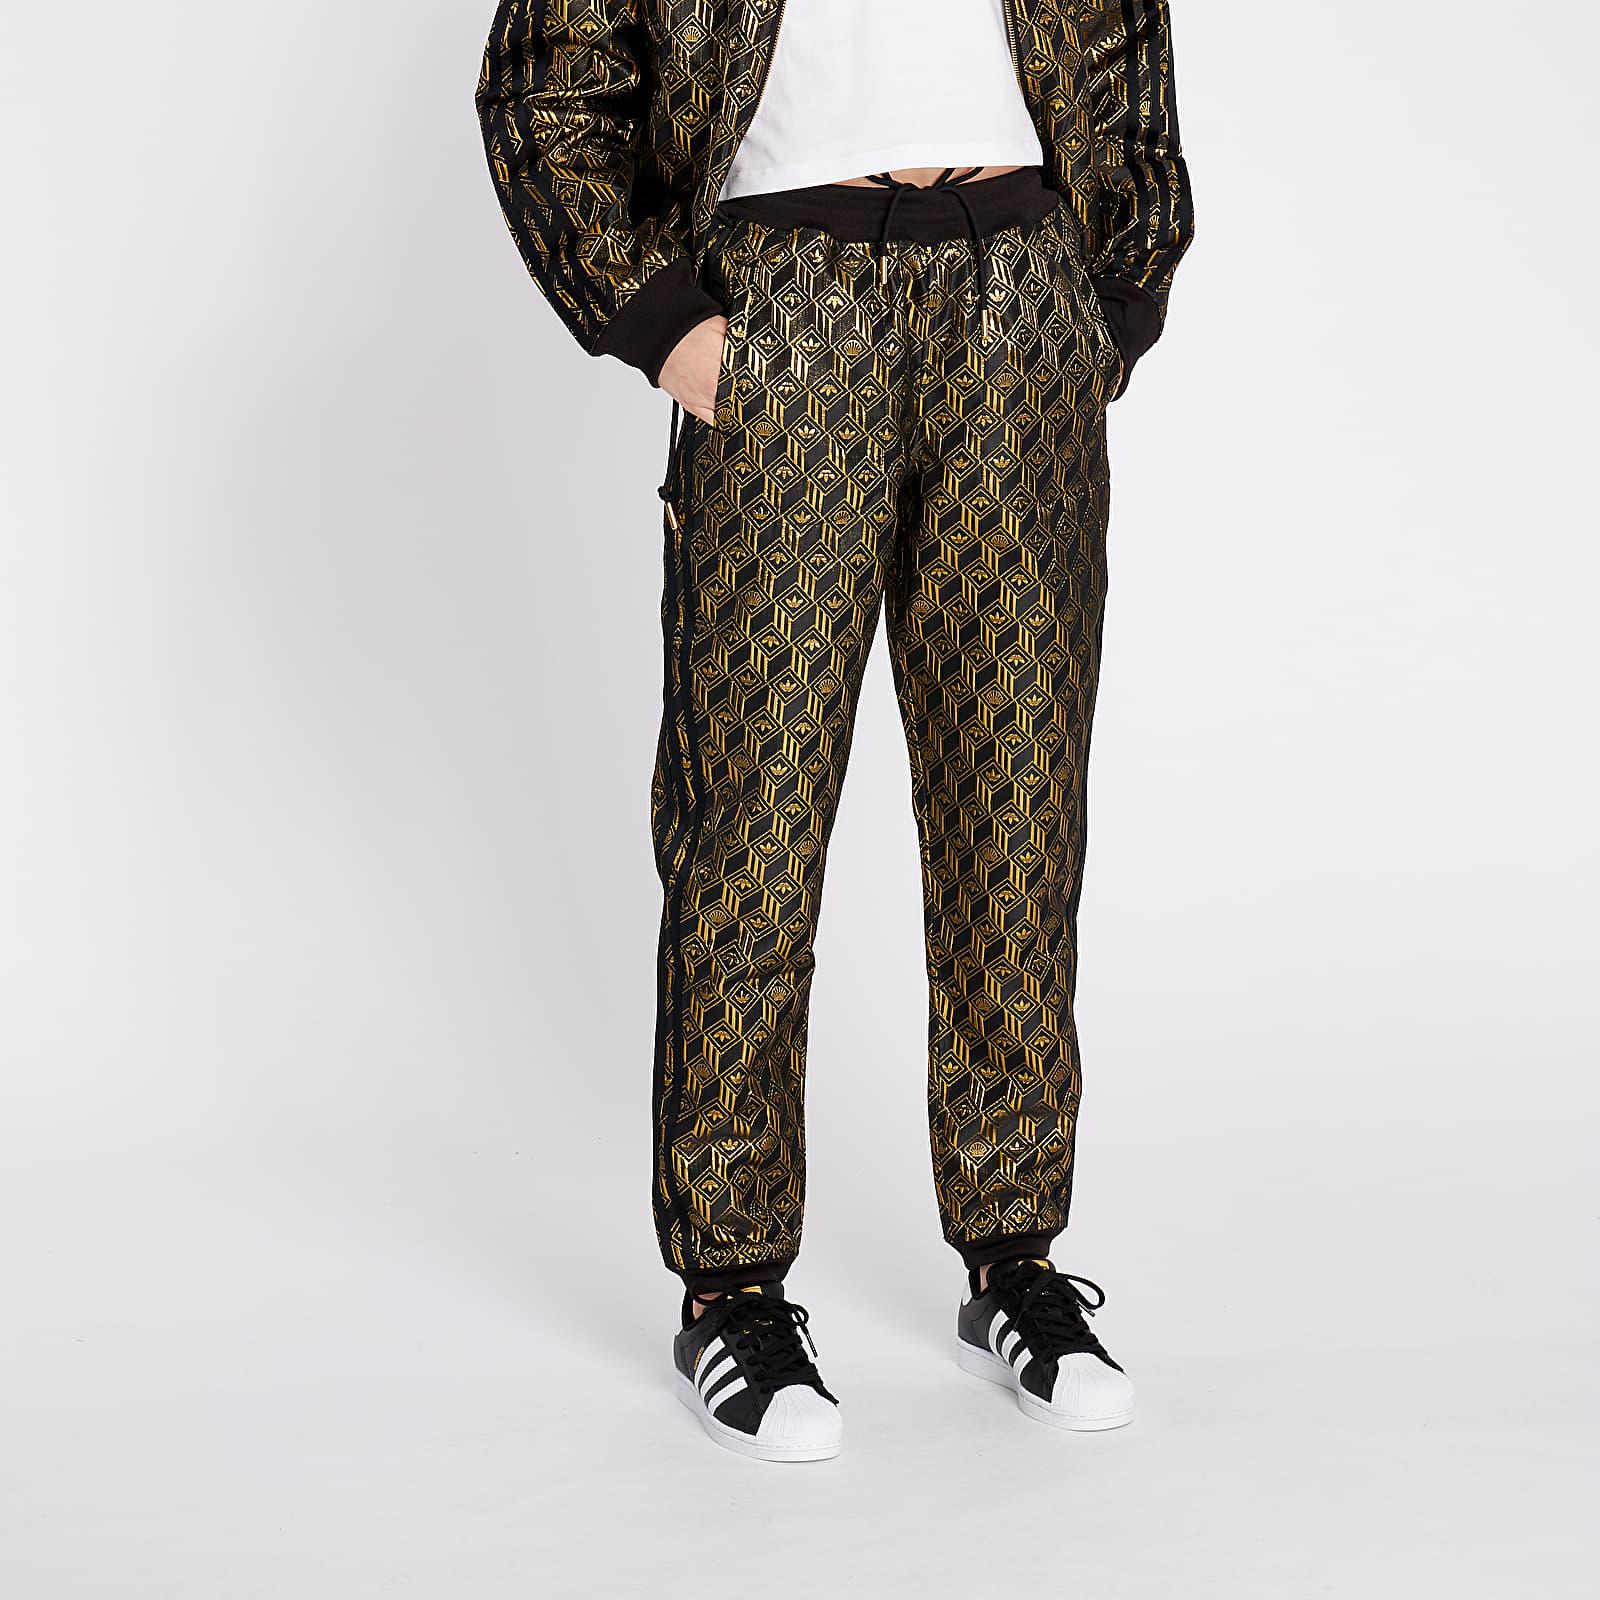 Nadrágok adidas Premium Superstar Trackpants Black/ Golden Metallic